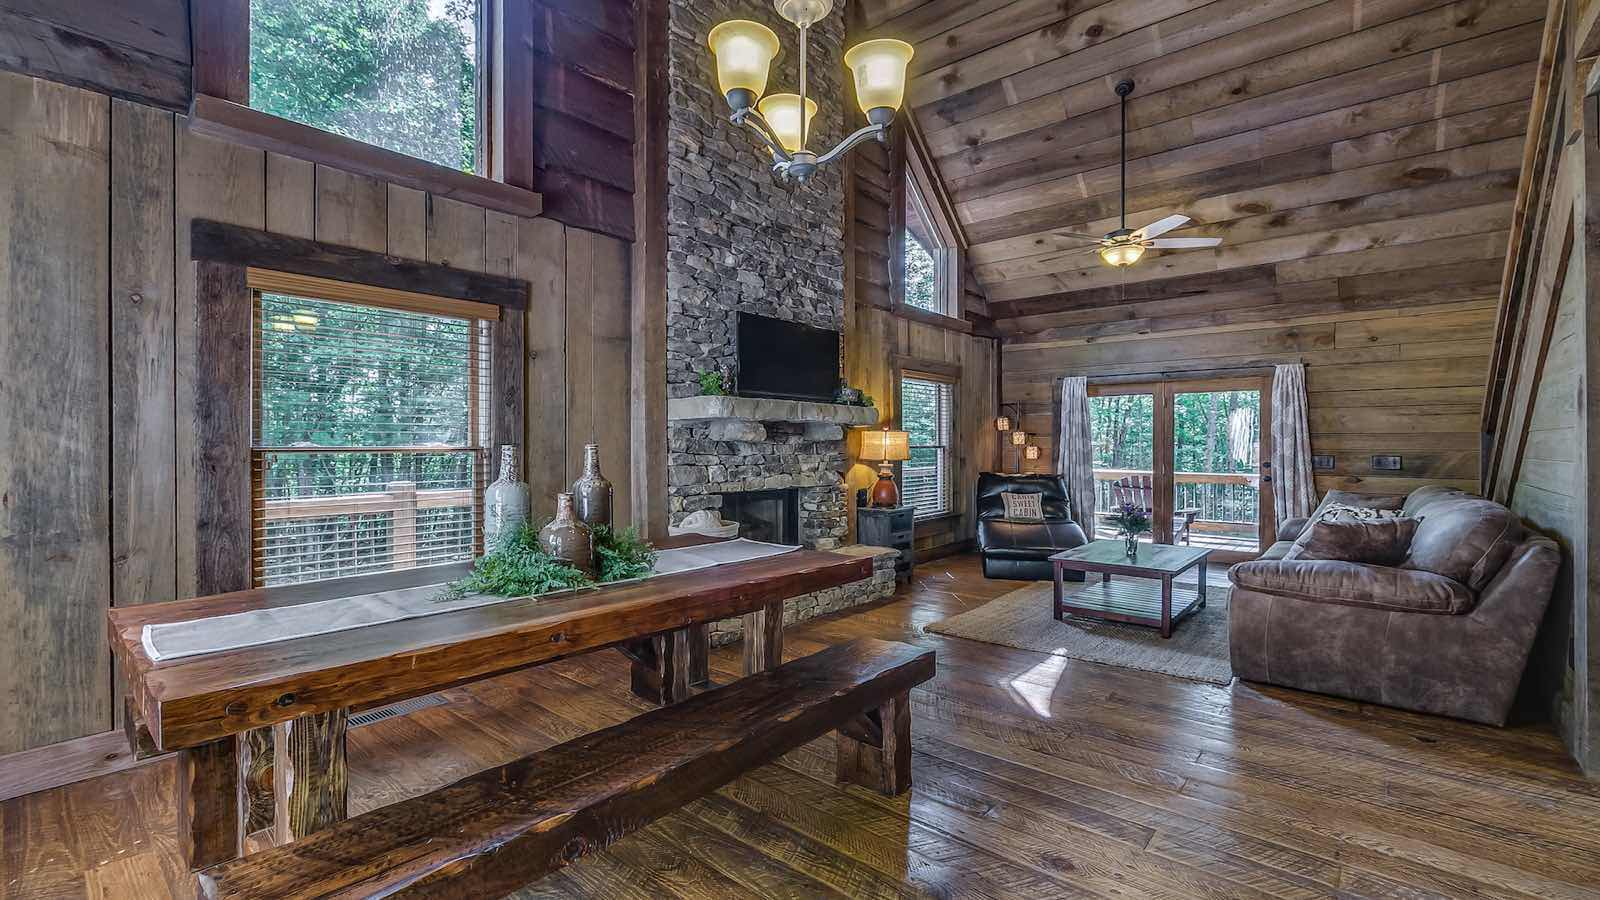 Refined Rustic Cabin Rental